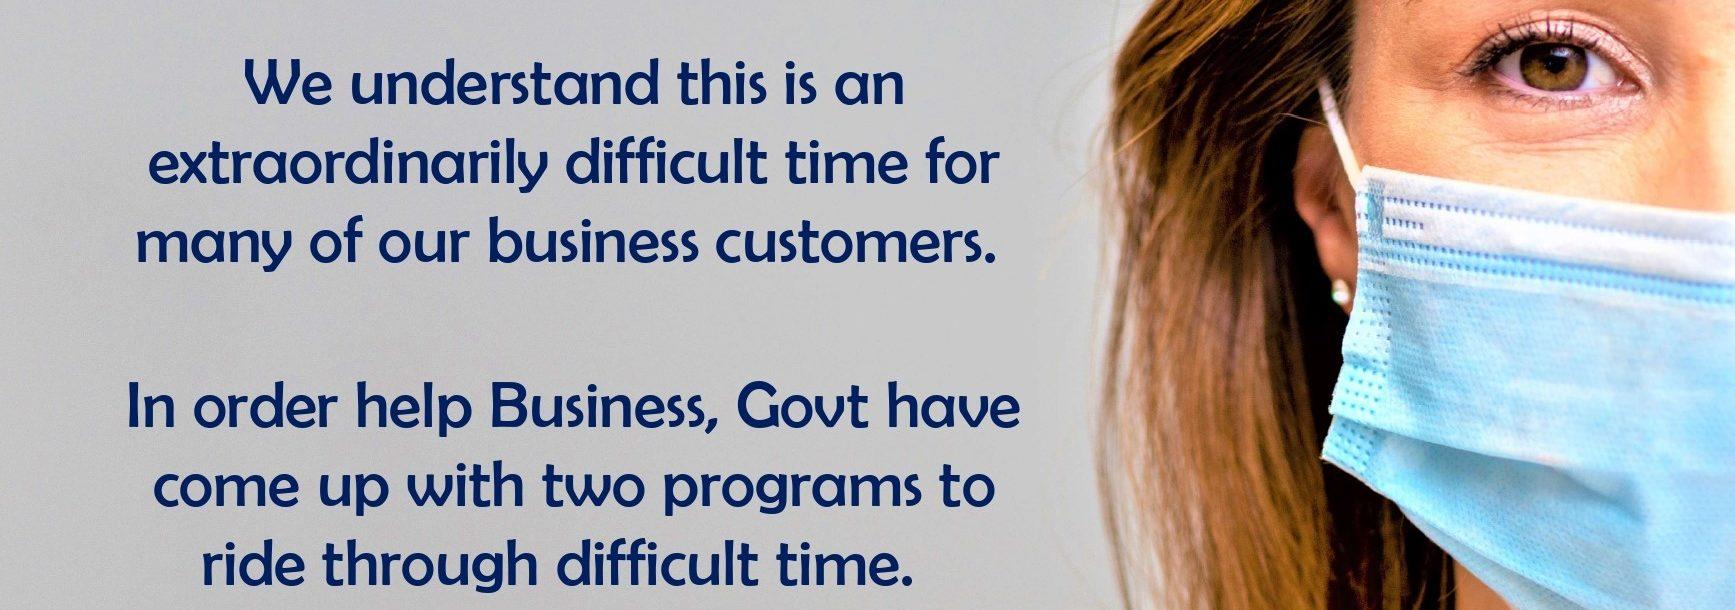 gov scheme poster